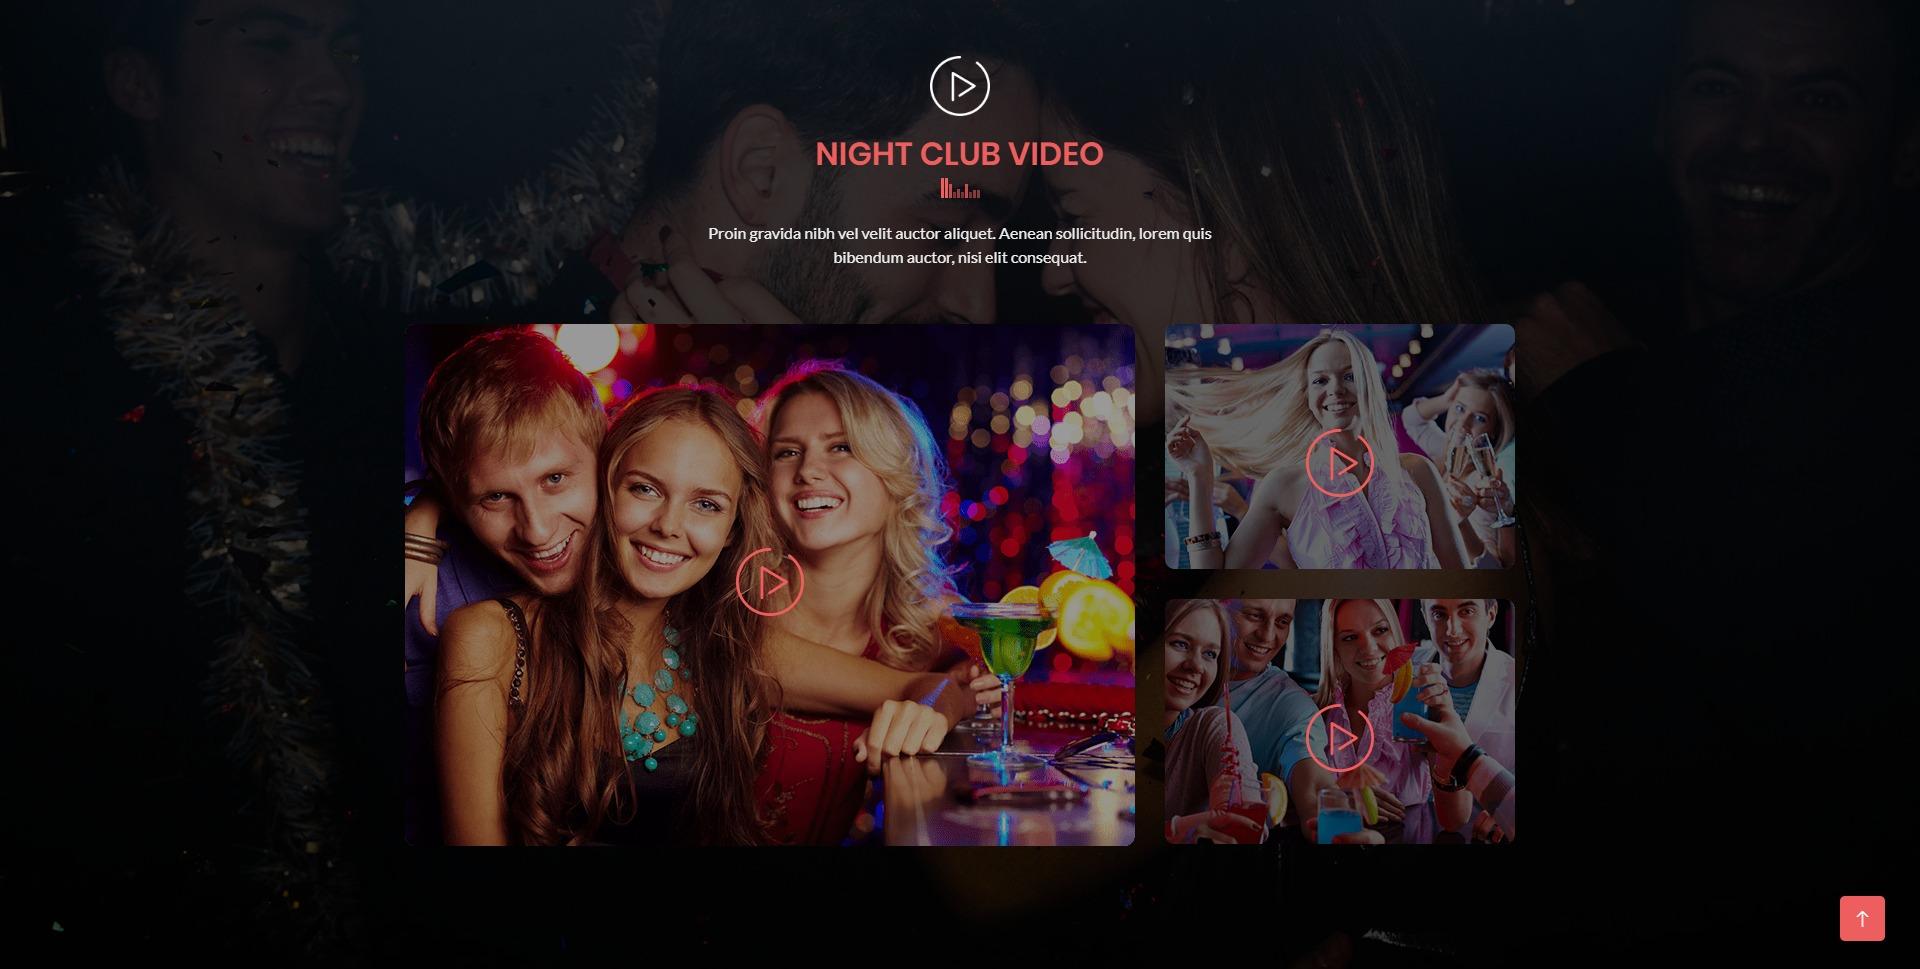 Domex-酒吧夜店网站WordPress主题模板